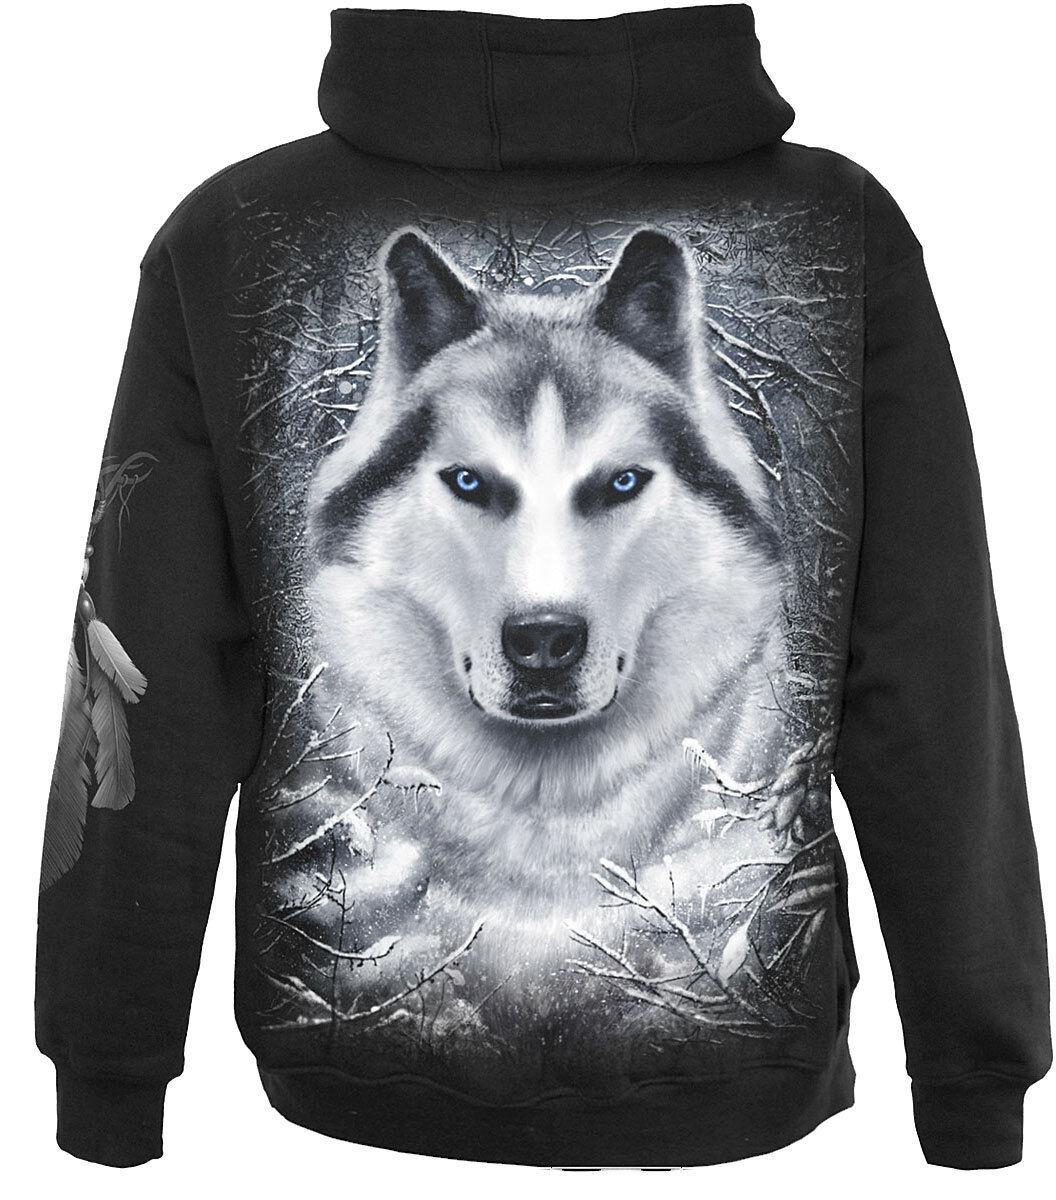 Spiral Direct Weiß Wolf Full Zip Hooded  Wild Sweatshirt Animal Hood Hoody